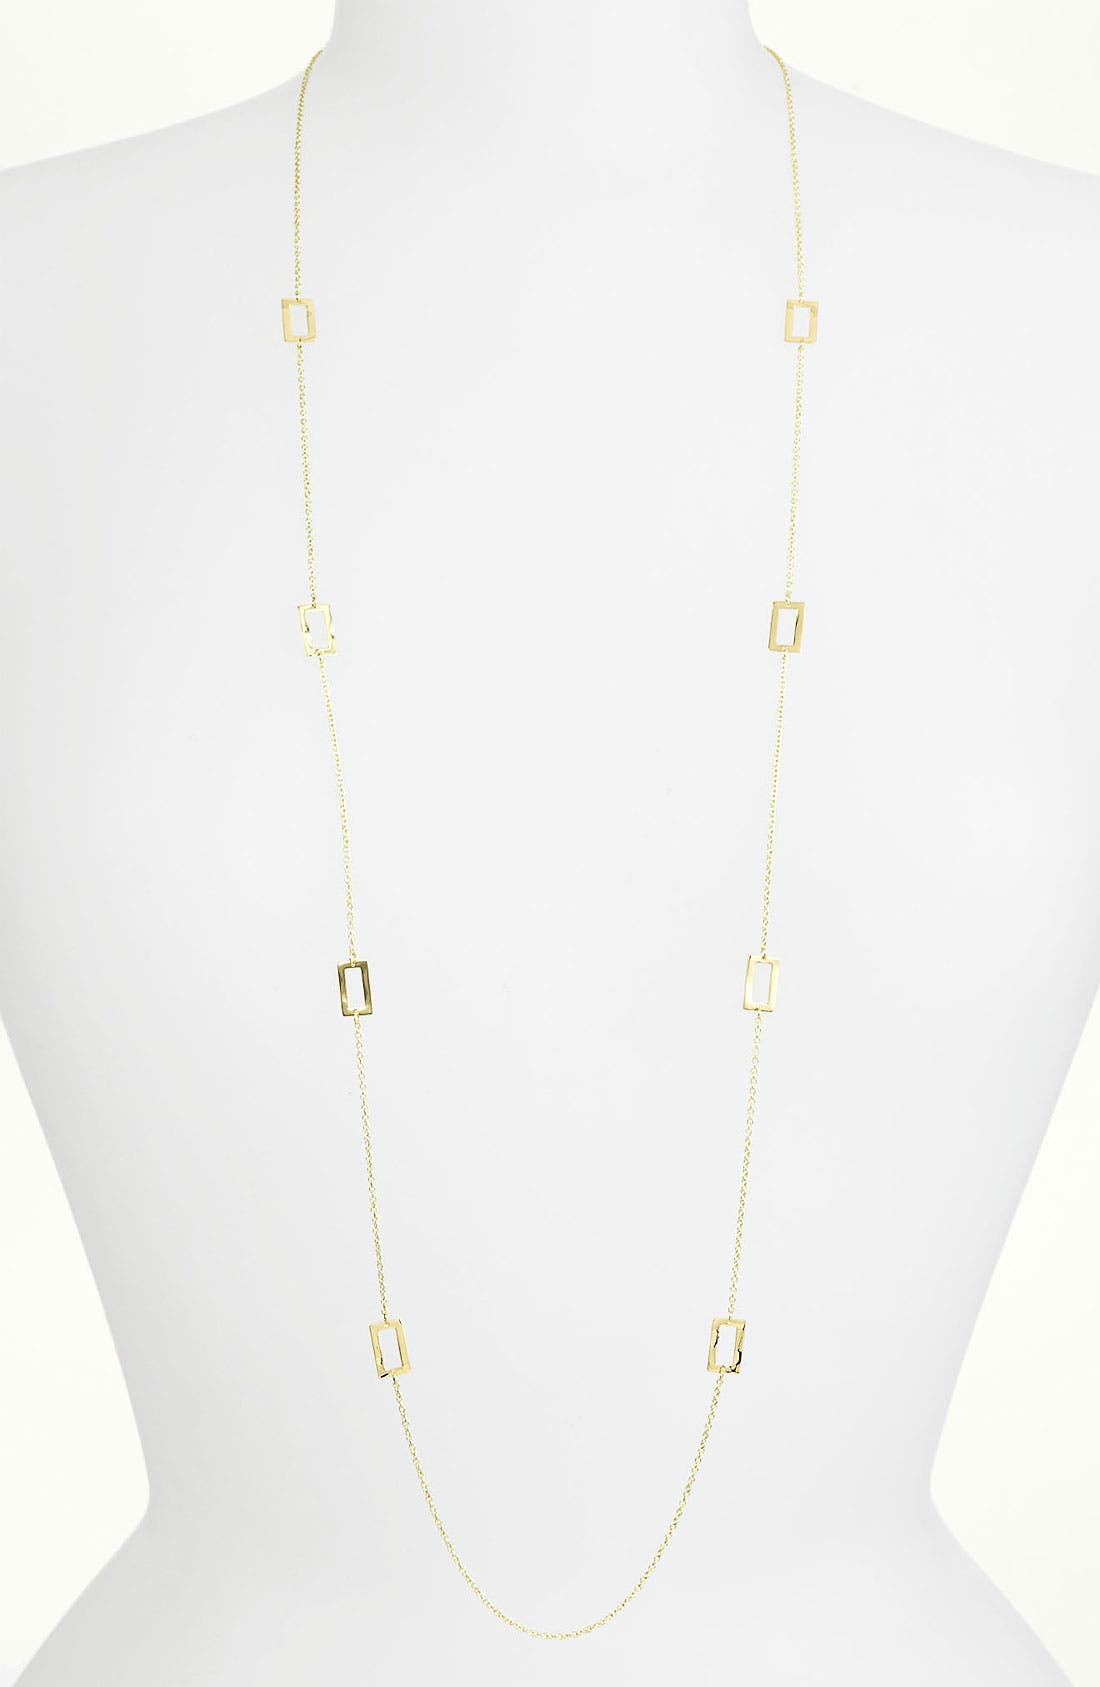 Main Image - Ippolita 'Plain' Long Rectangle Station 18k Gold Necklace